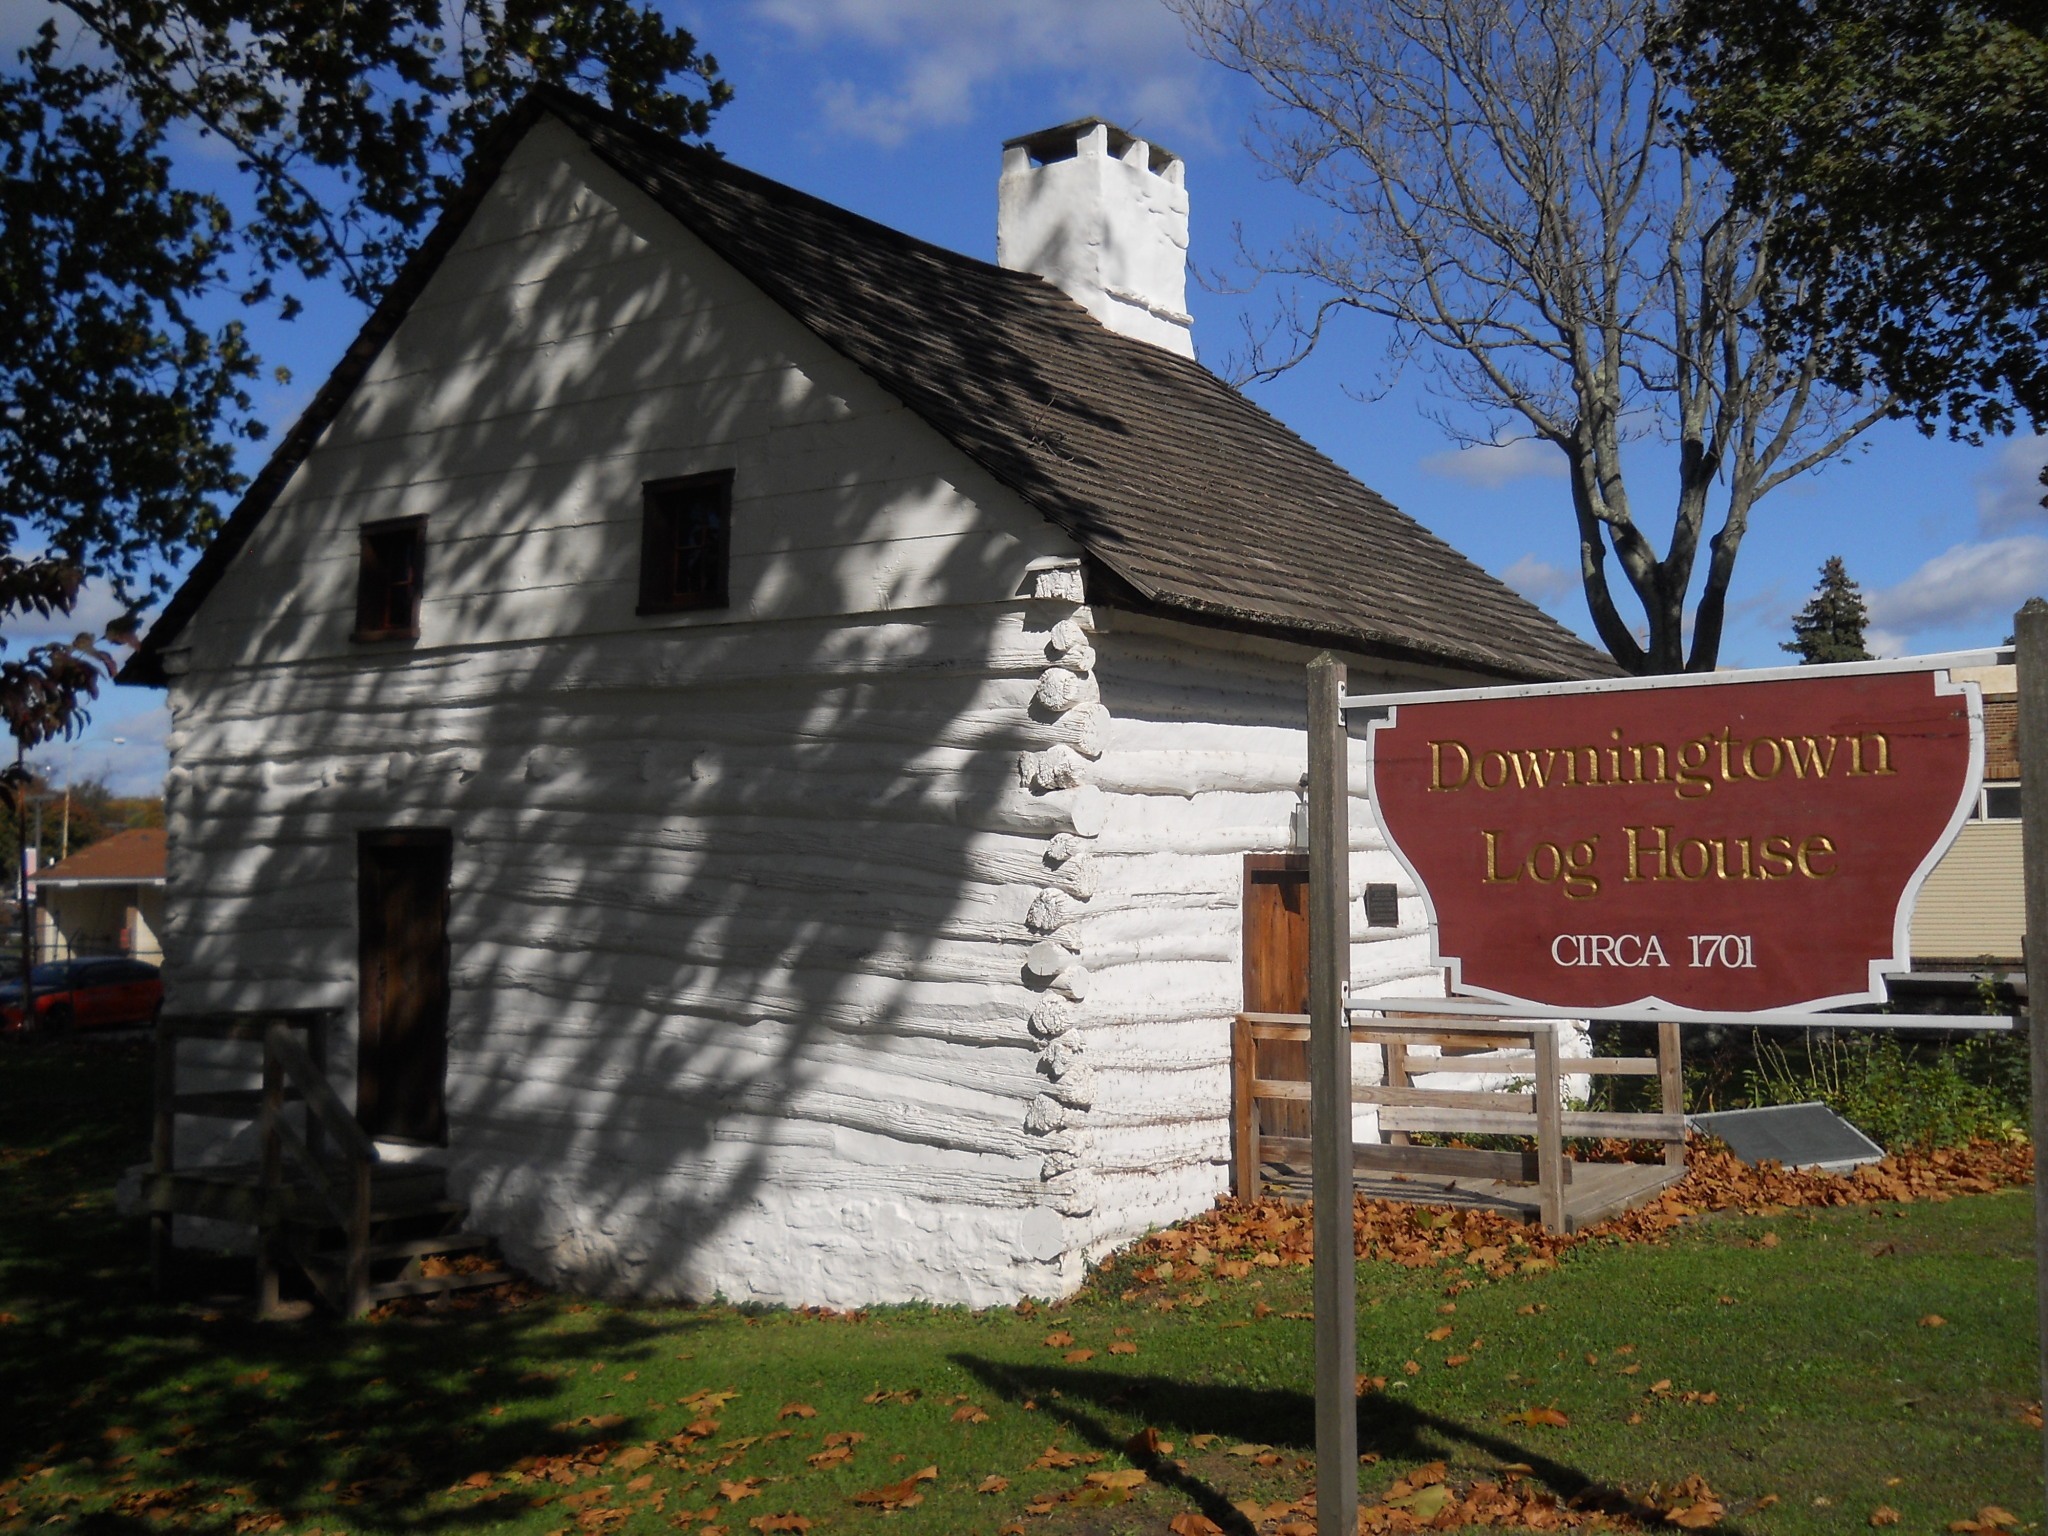 Historic Downingtown Log House, within Lancaster Avenue bridge project area